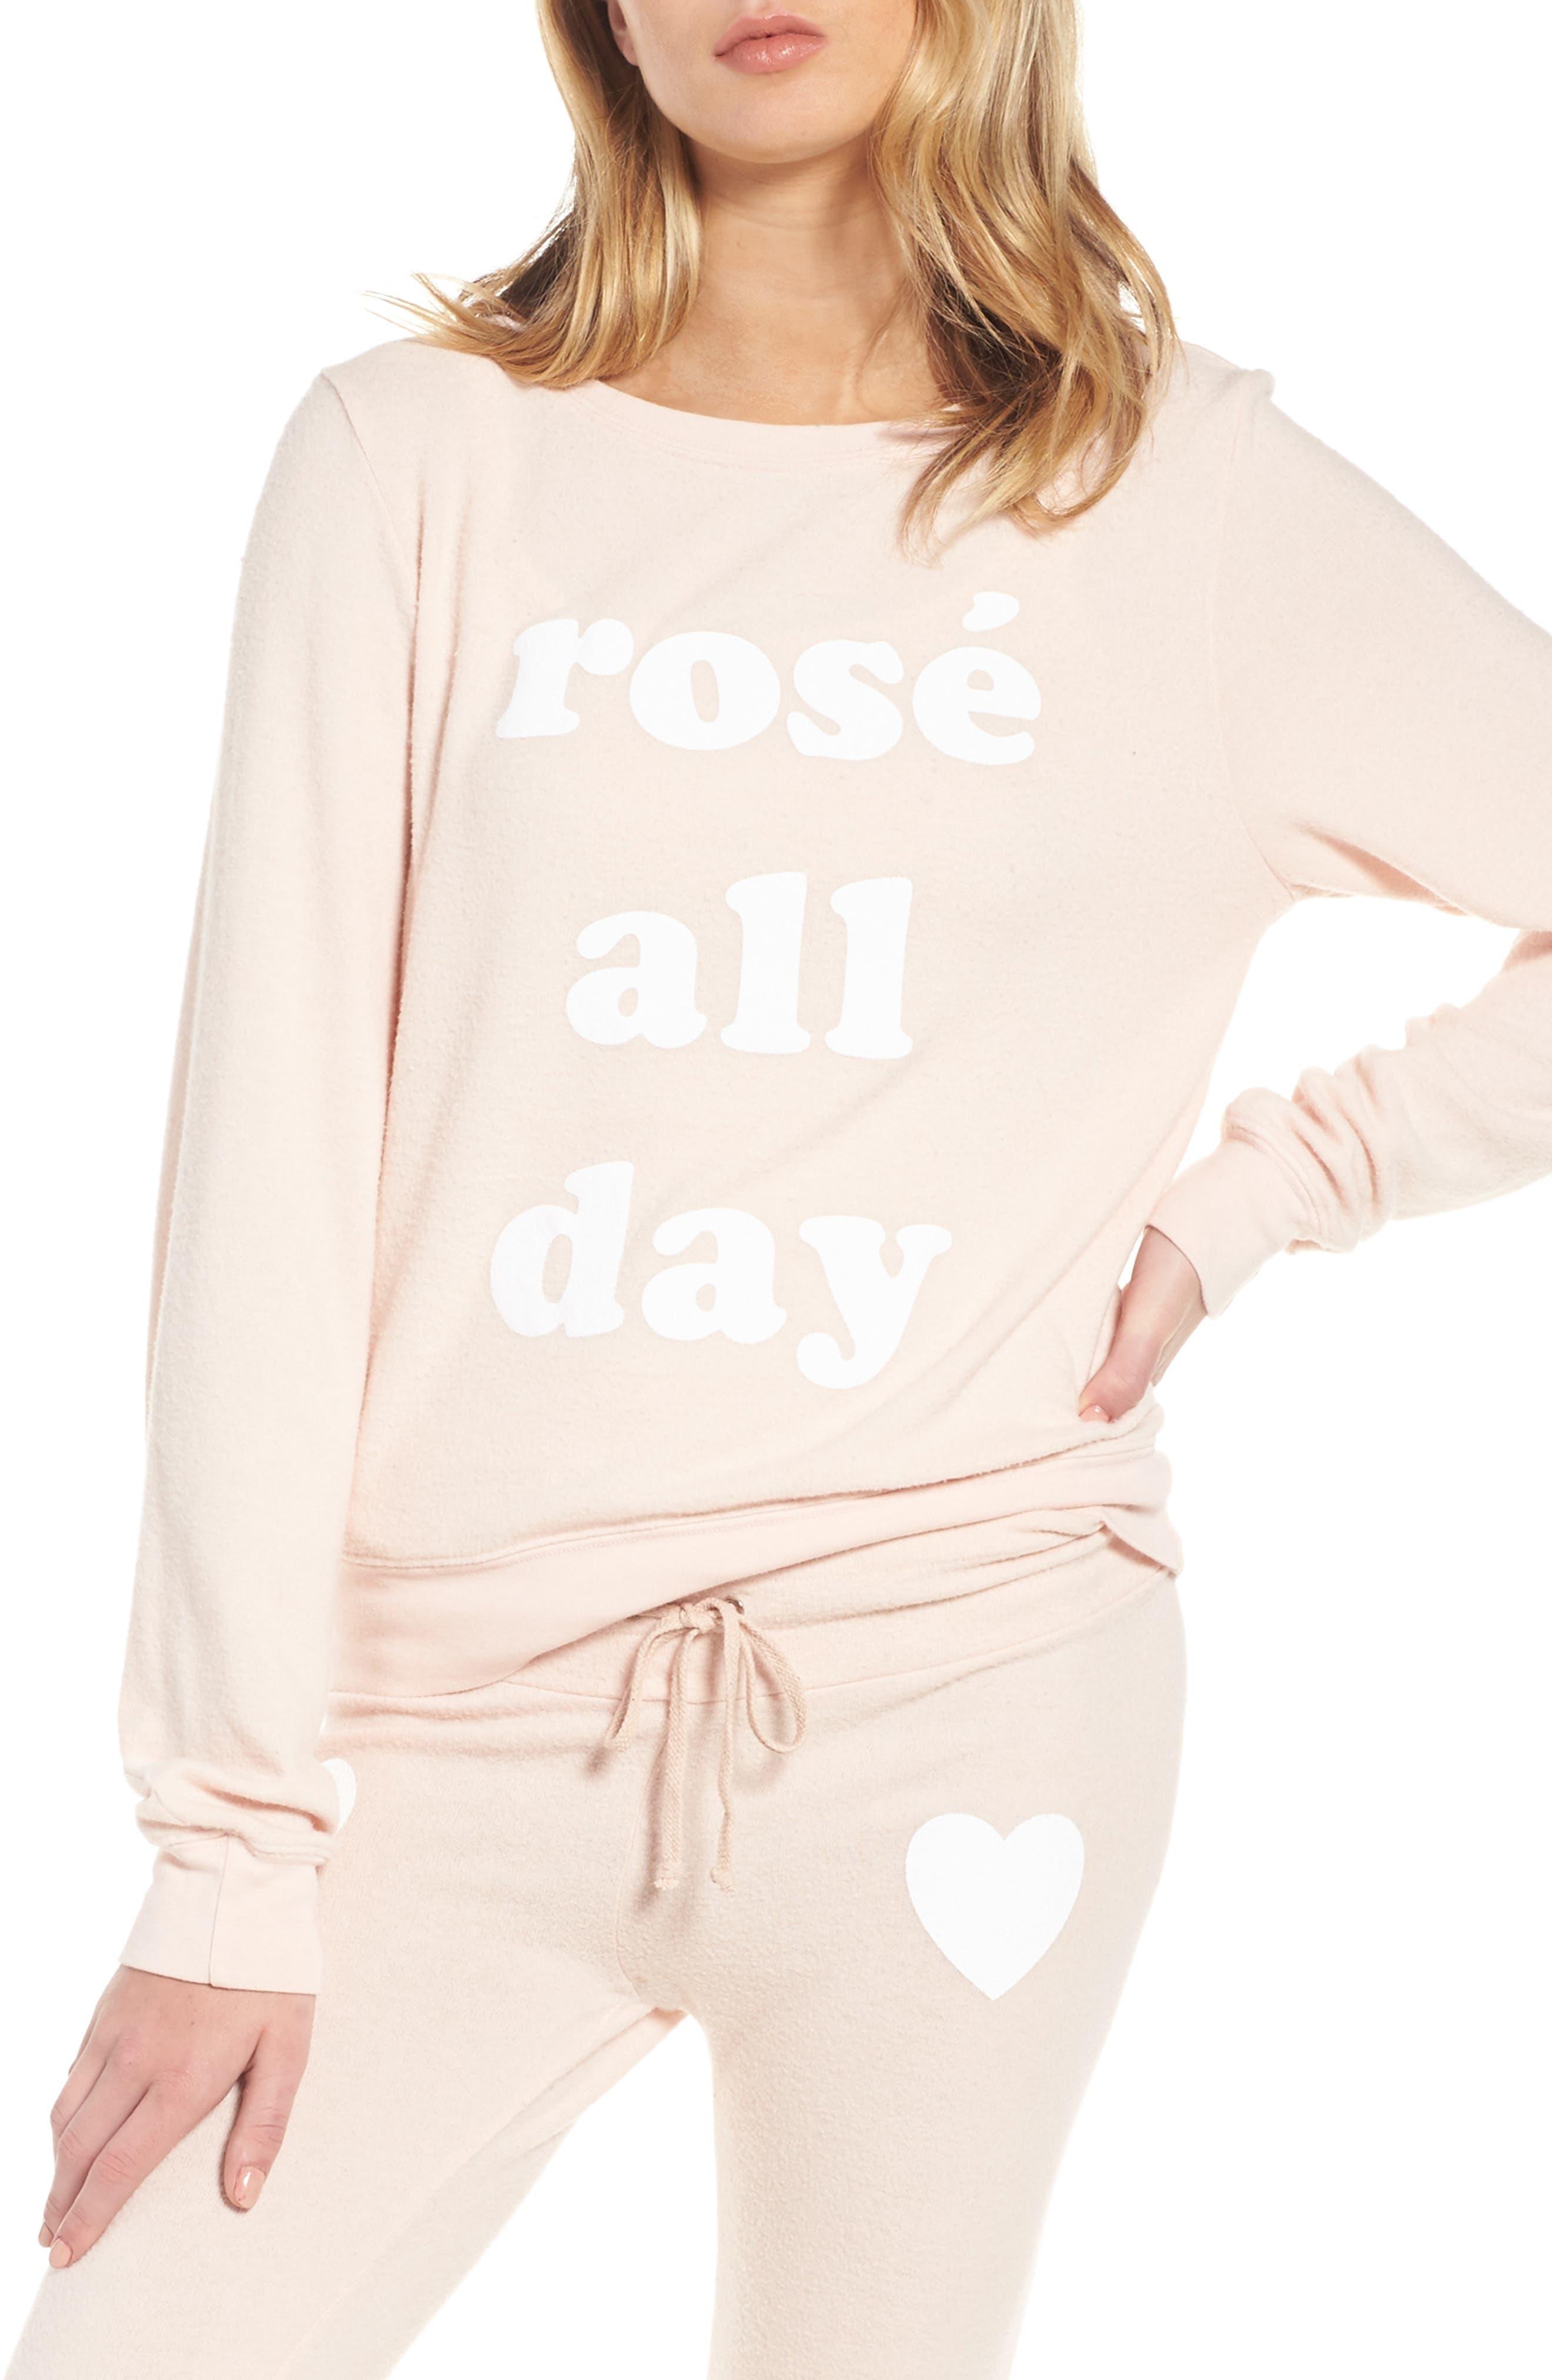 Main Image - Dream Scene Rosé All Day Sweatshirt